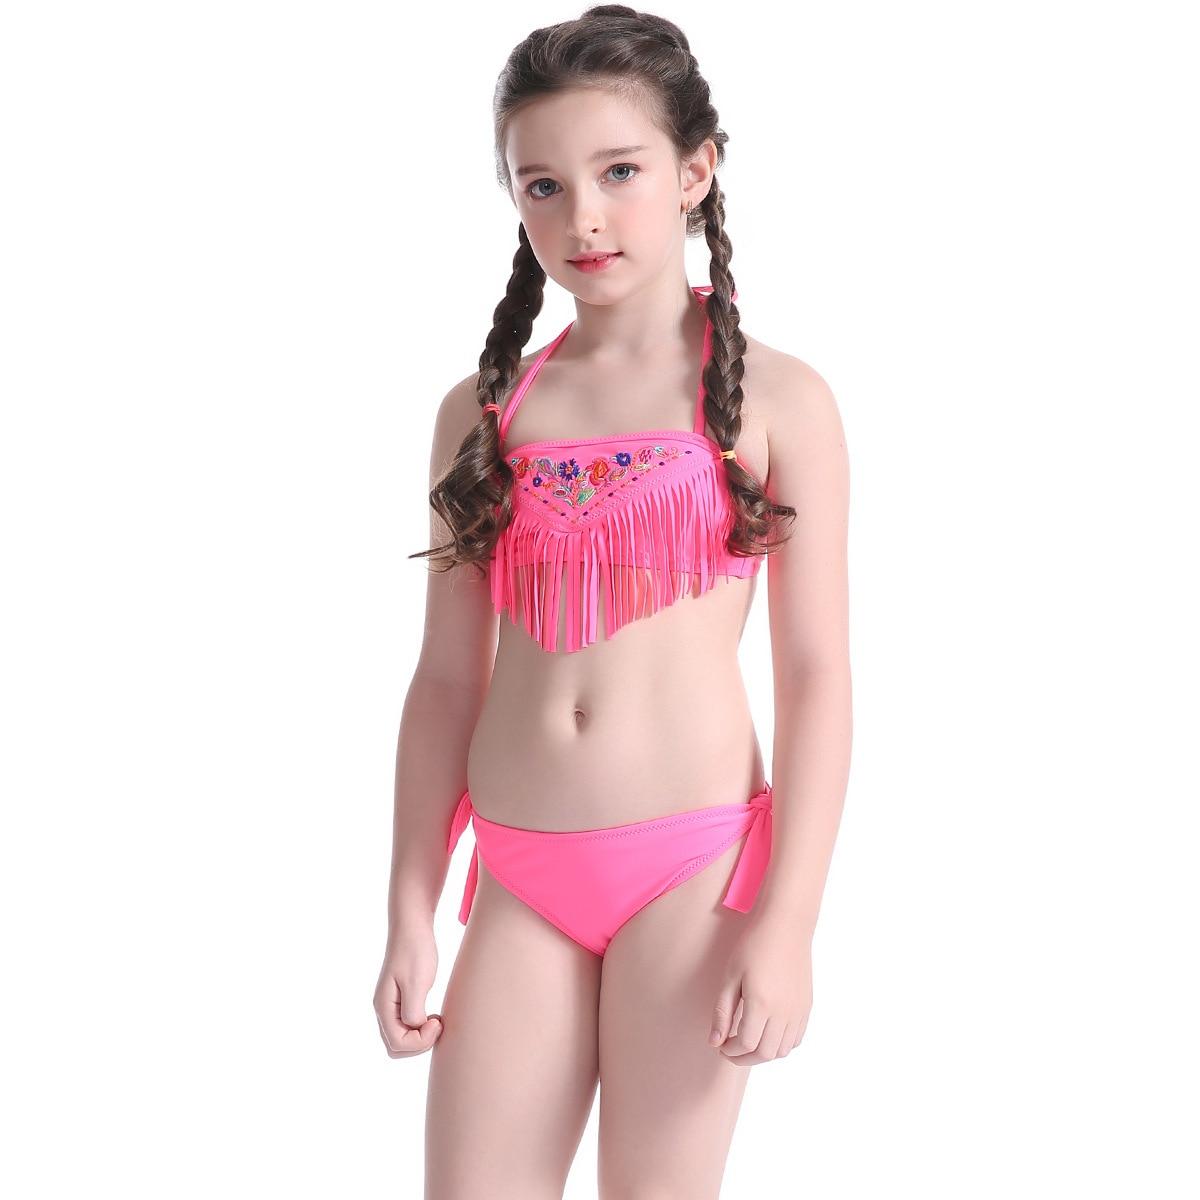 Girls bathing suits bikini agree